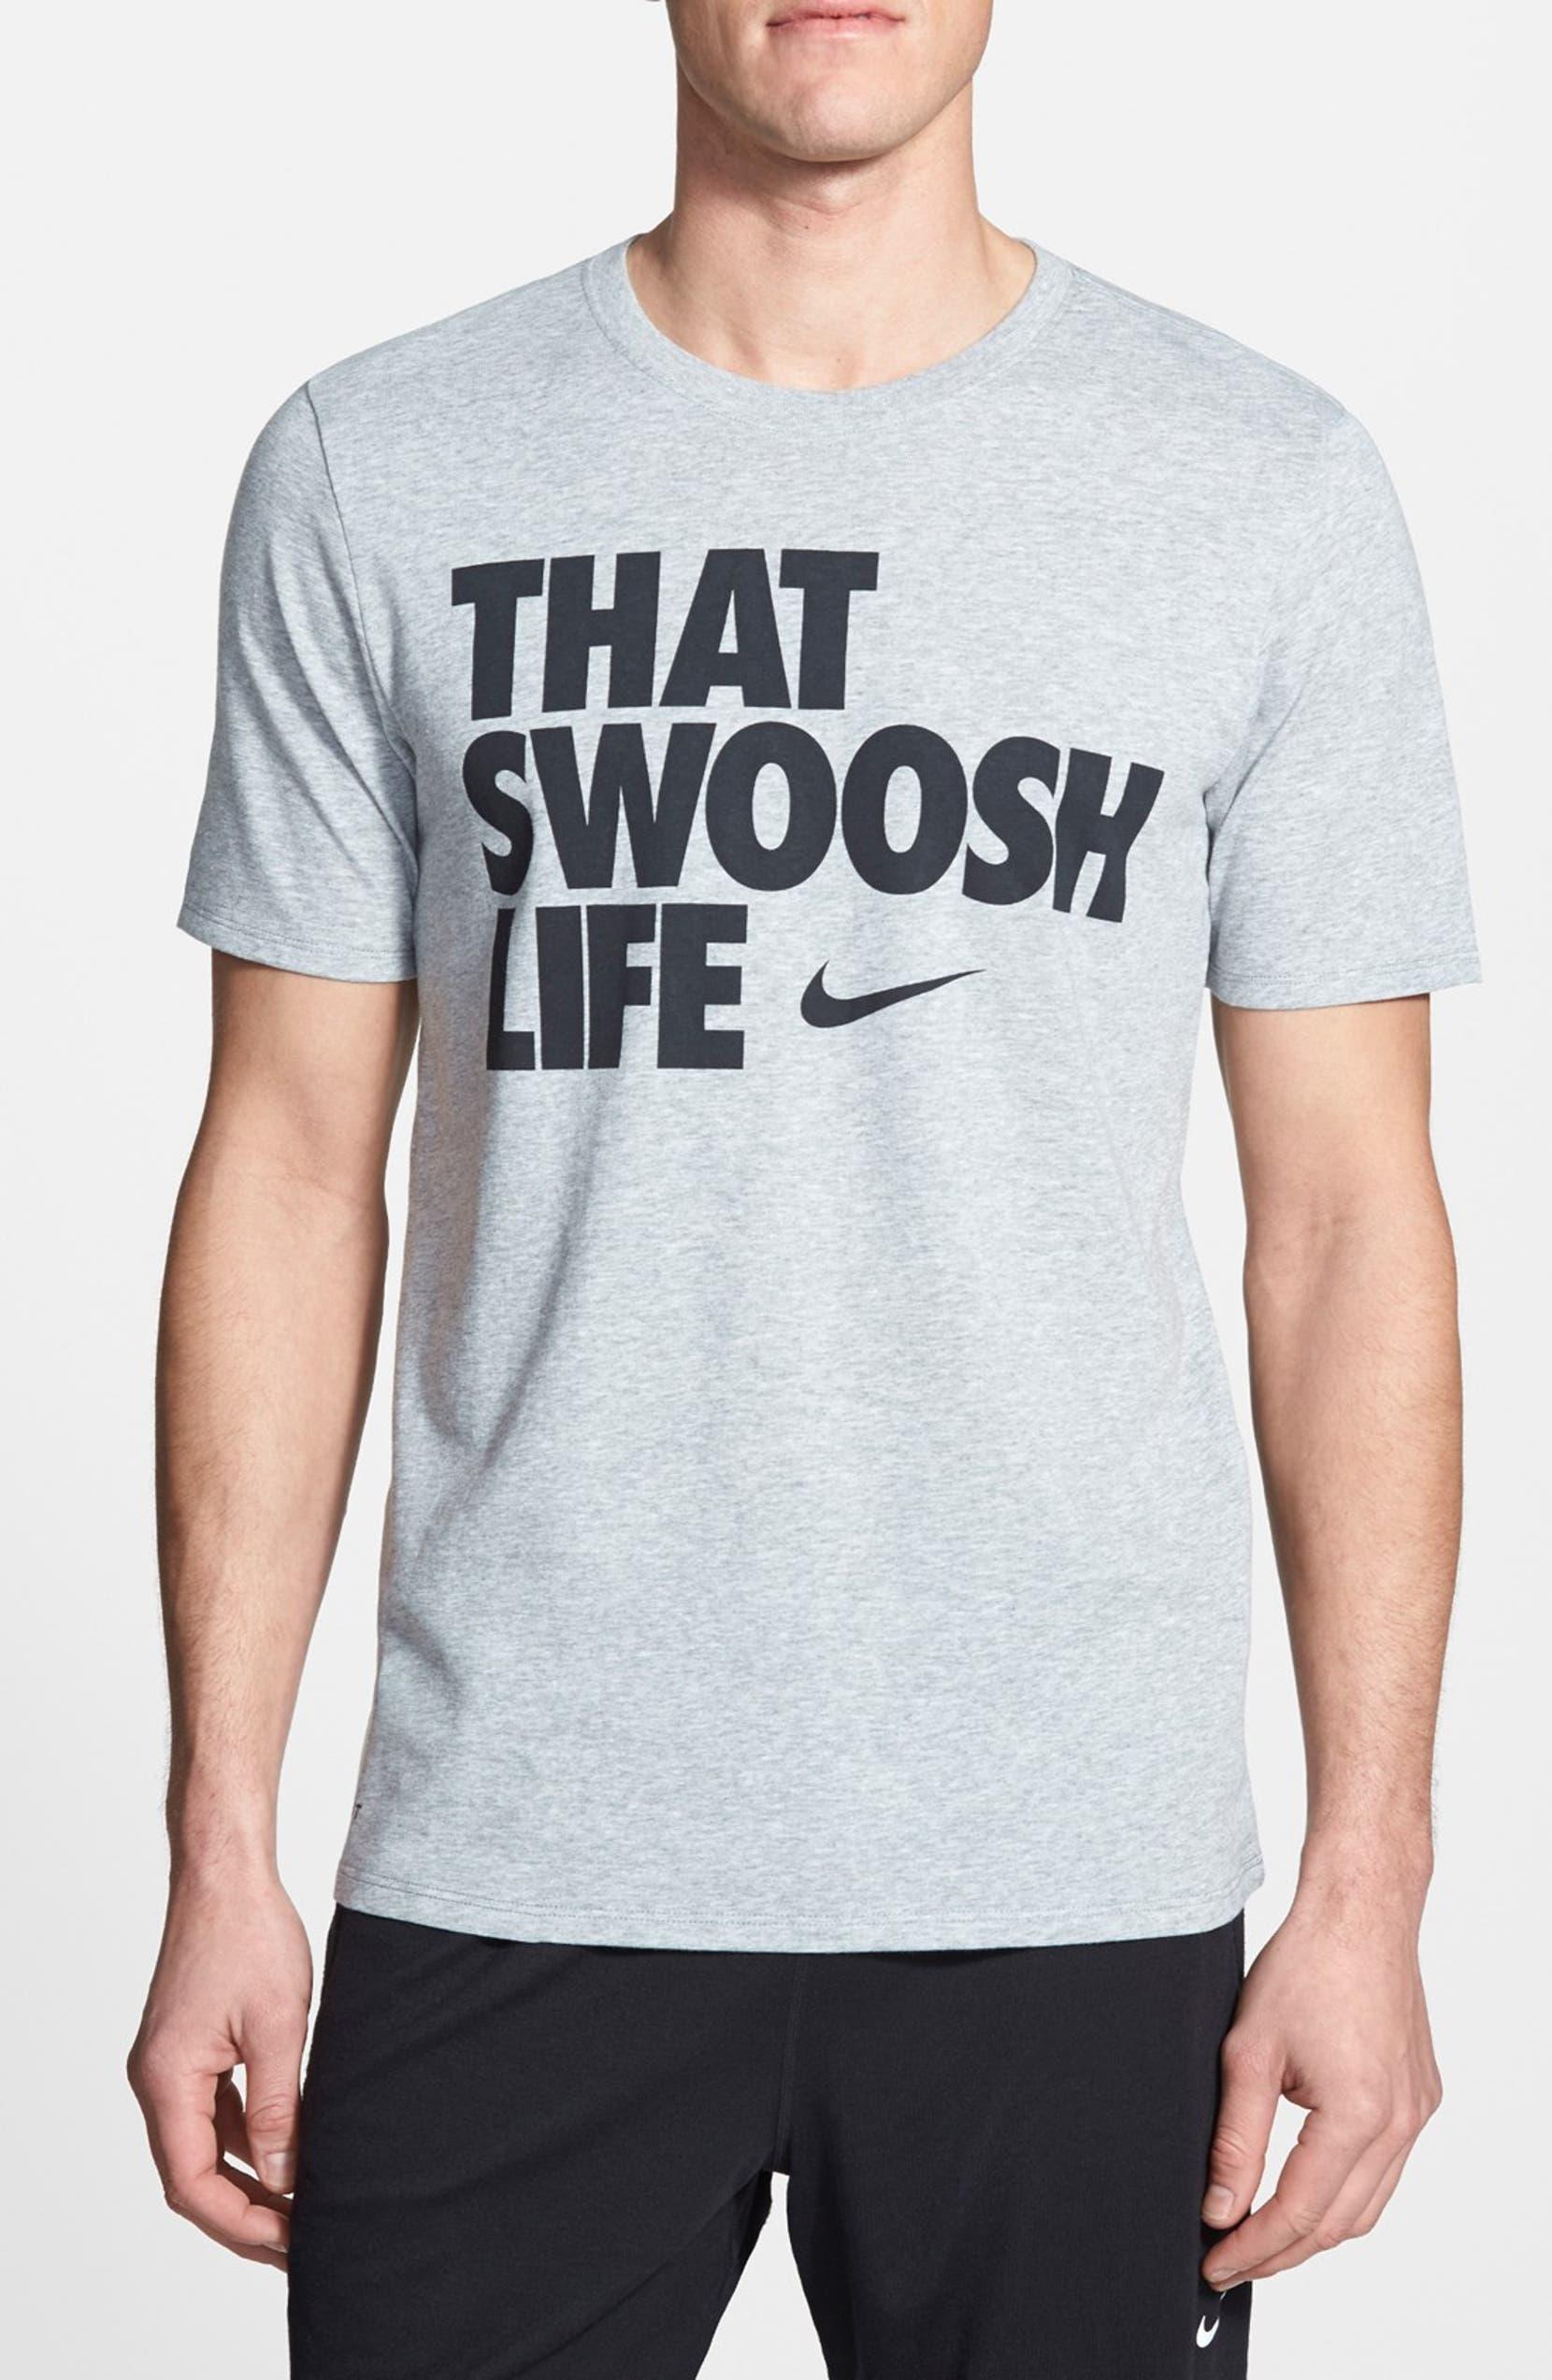 79ef7708 Nike 'That Swoosh Life' Dri-FIT Graphic T-Shirt | Nordstrom